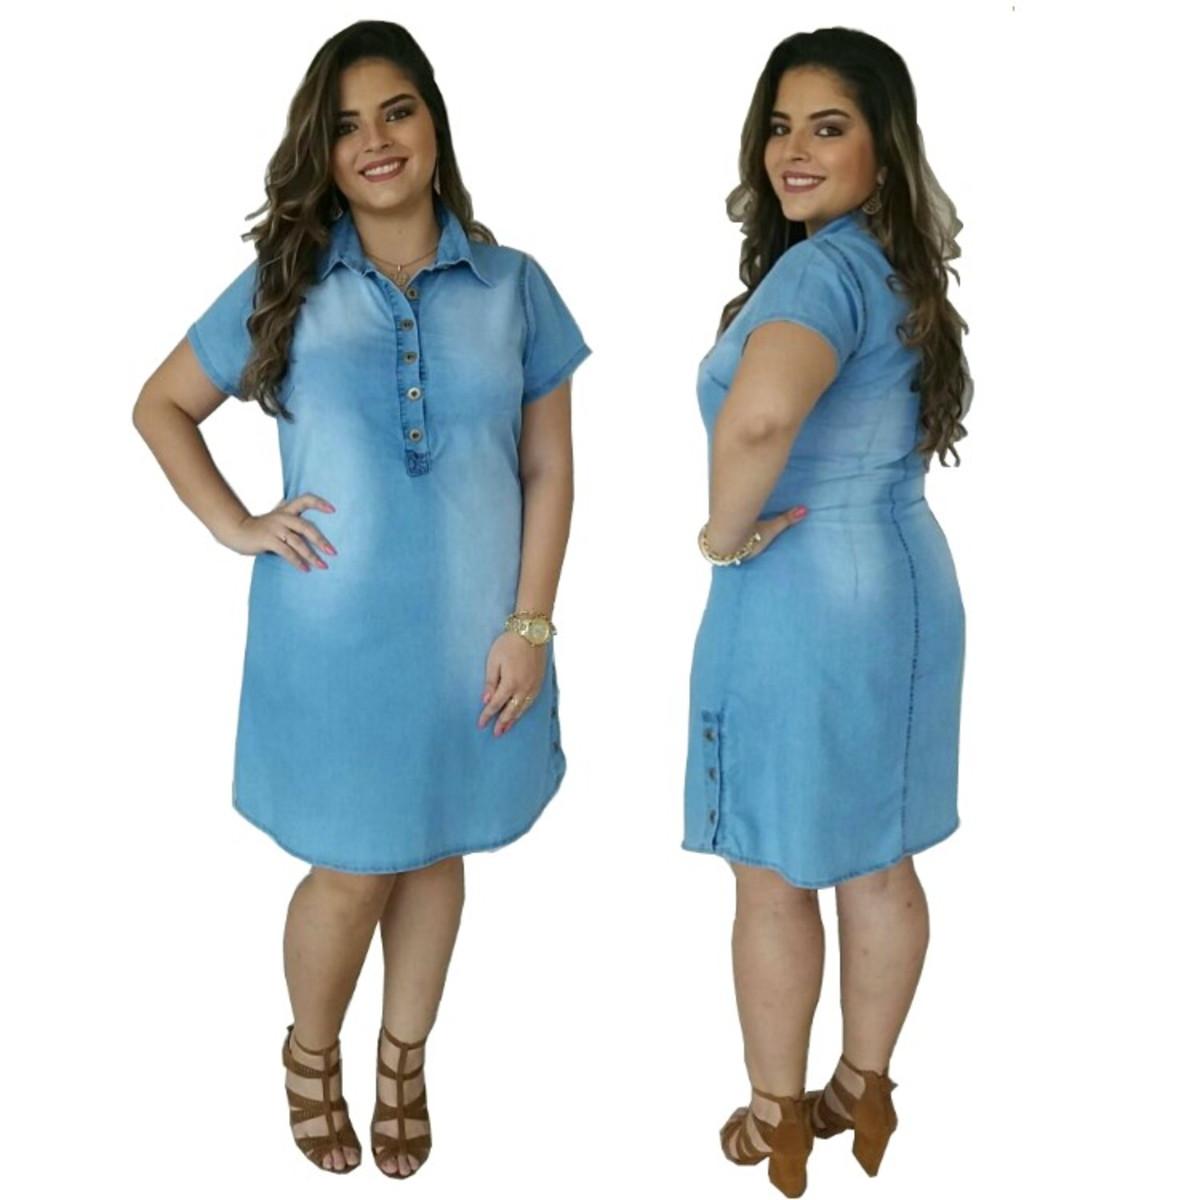 e3bfe009702 Roupas Femininas Vestido Jeans Plus Size Vestido Plus Size no Elo7 ...